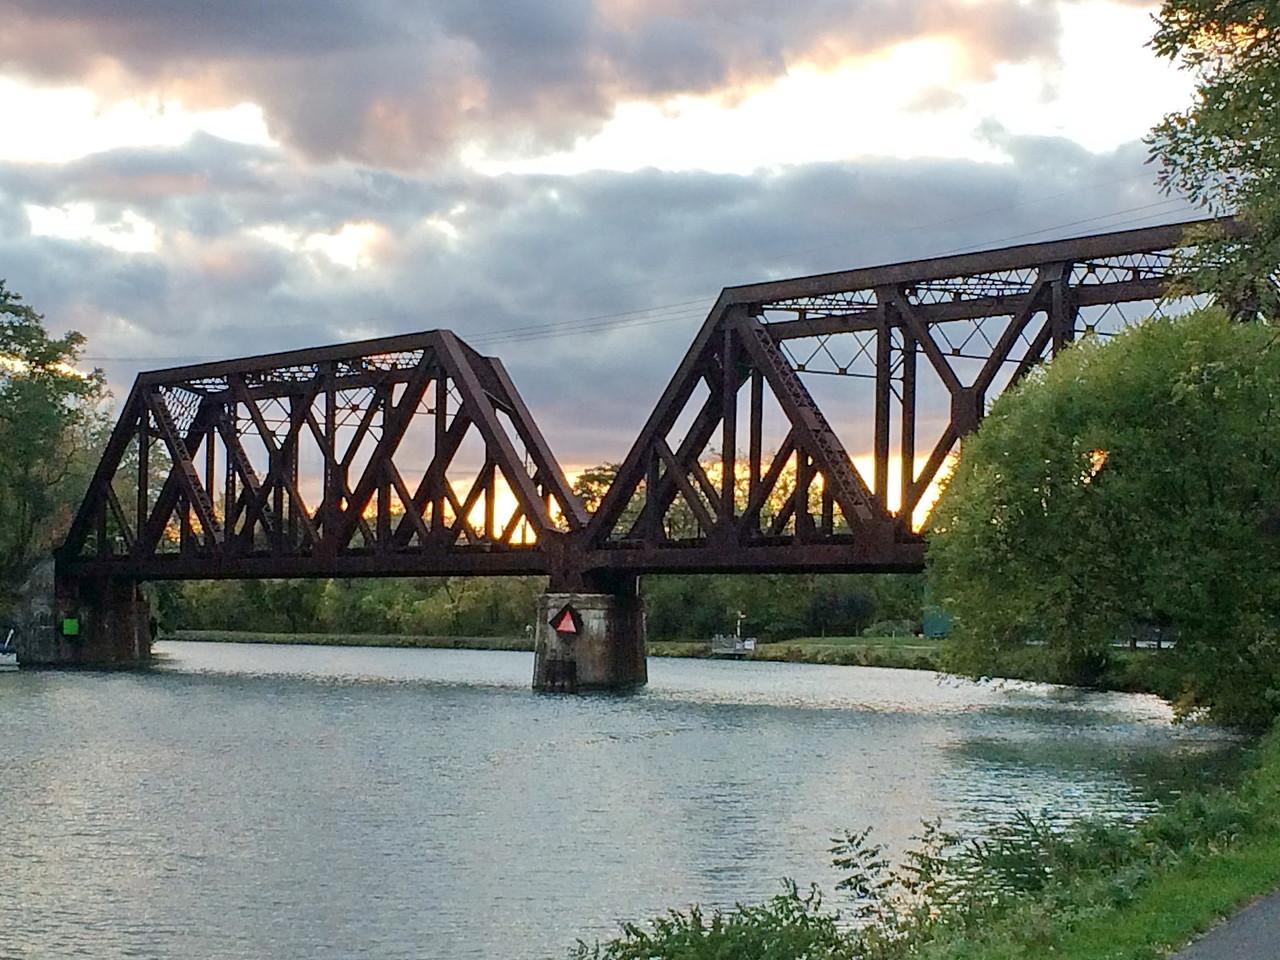 Railroad Bridge over the Erie Canal